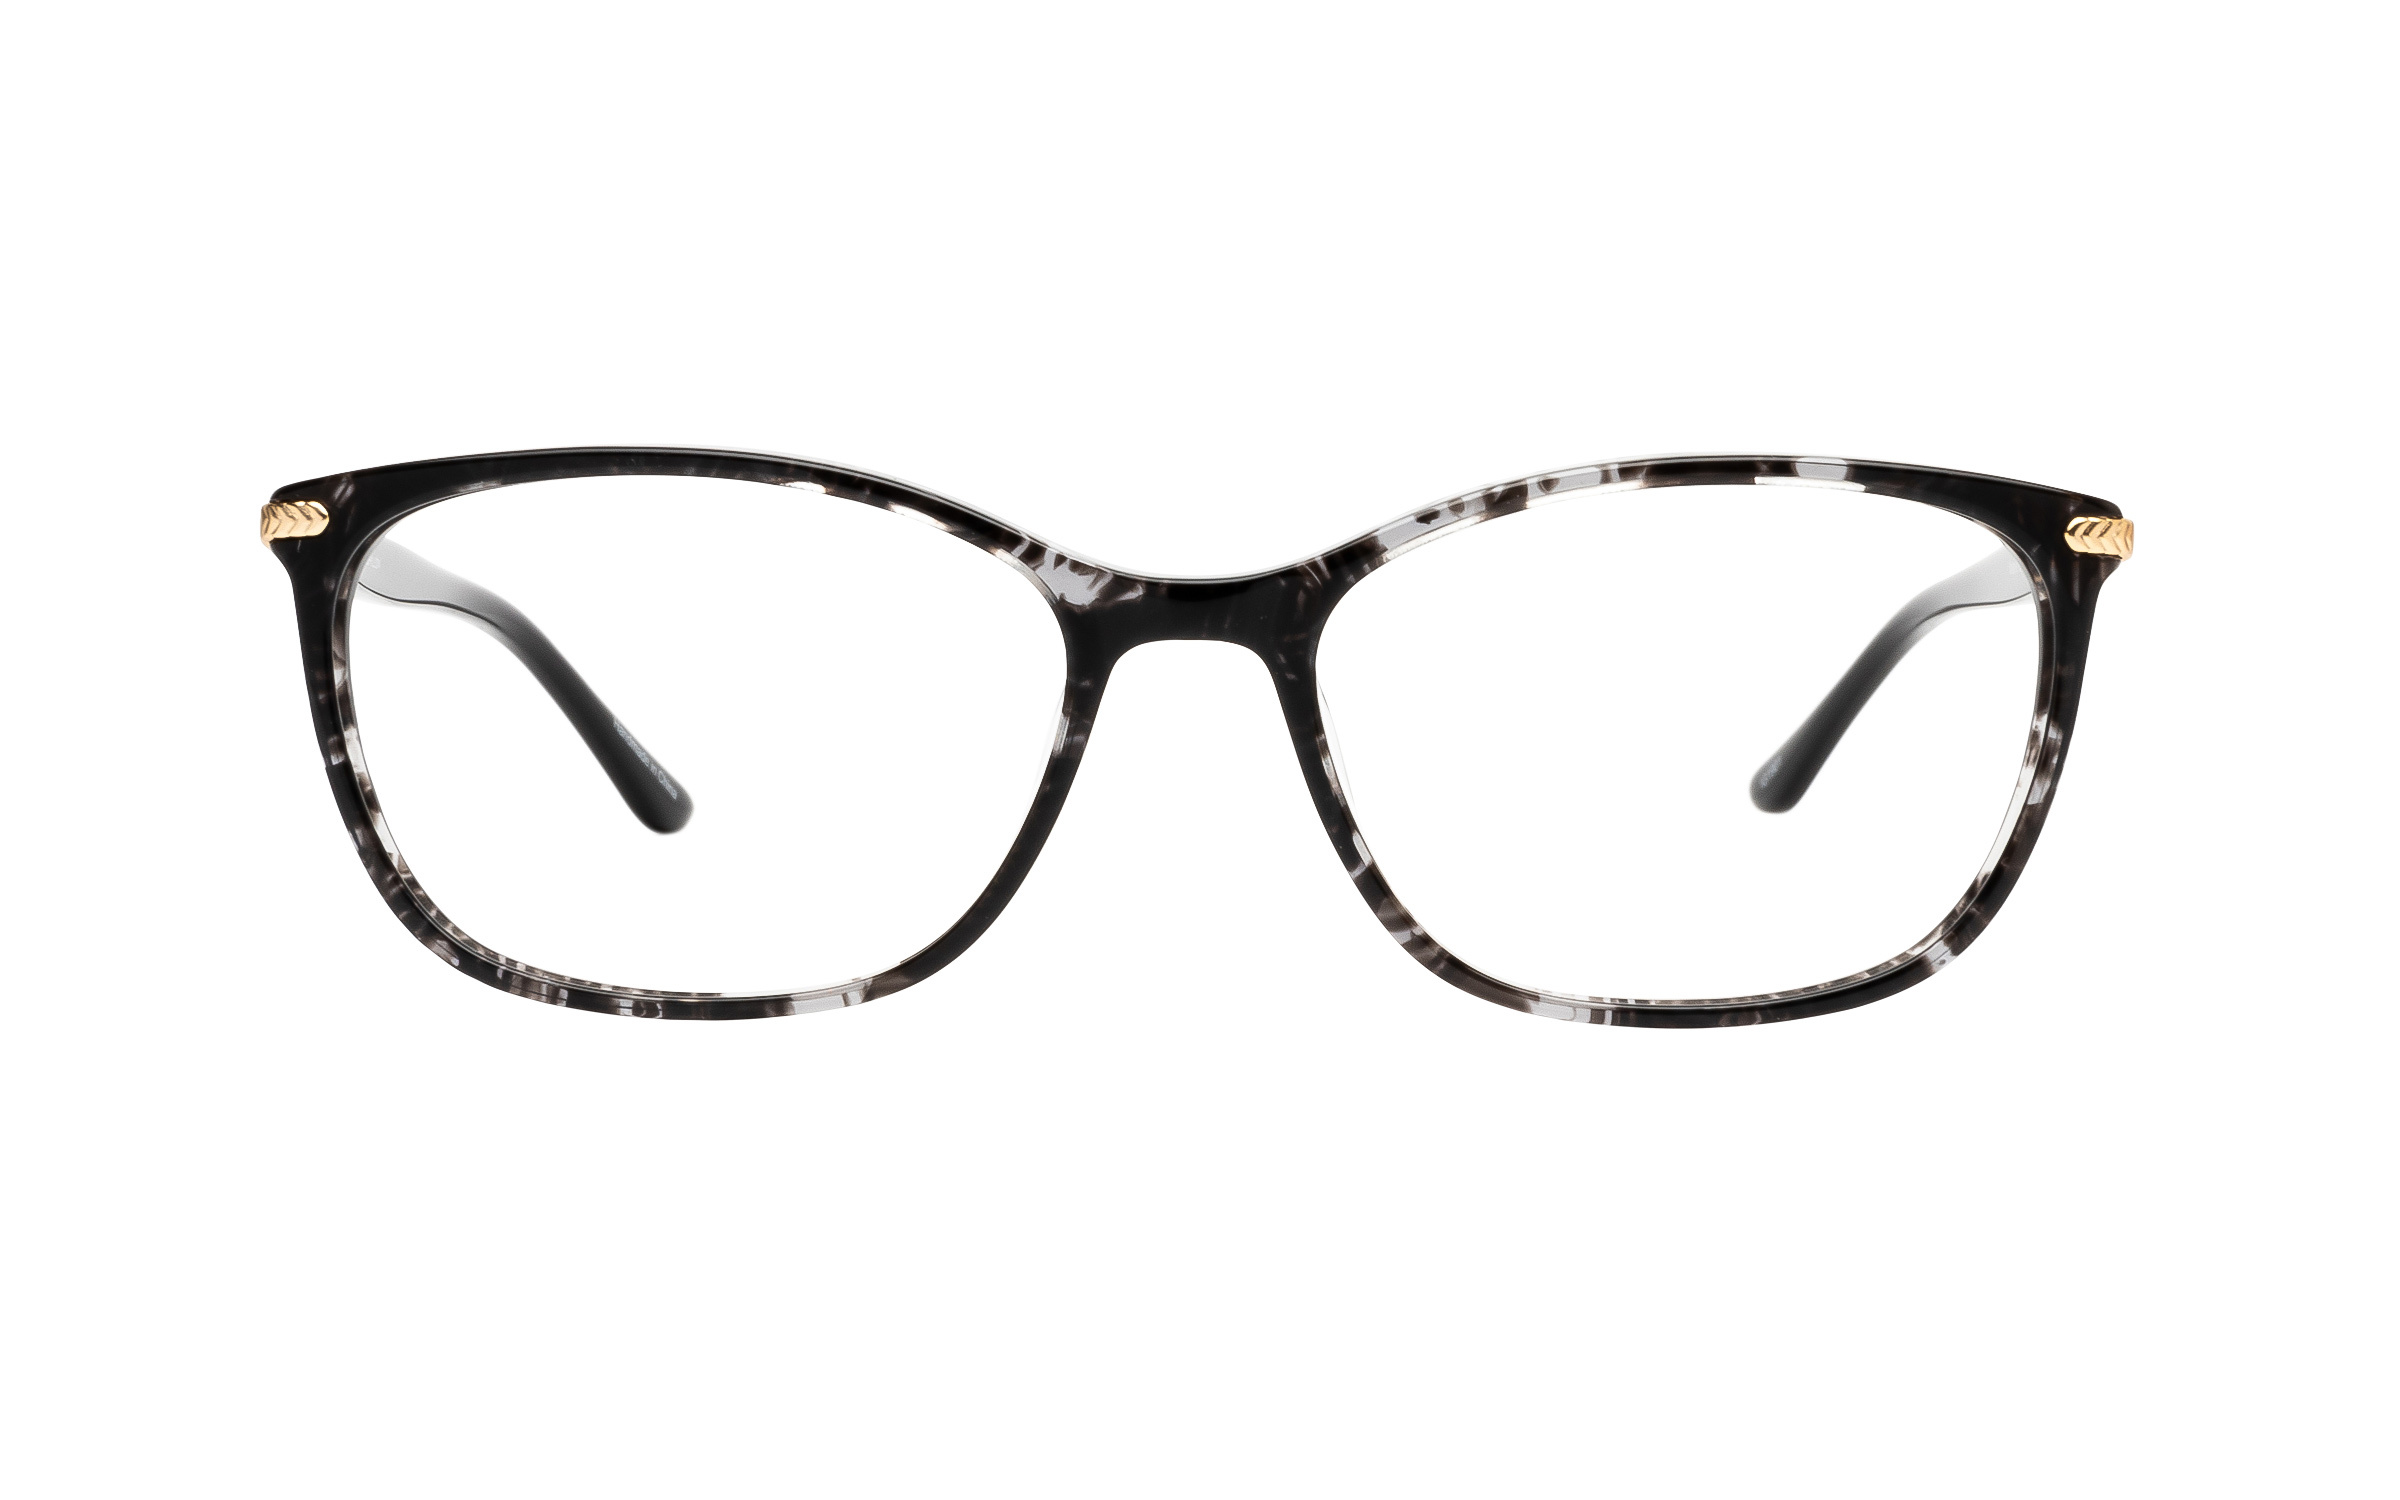 Kam Dhillon Natalie (54) Eyeglasses and Frame in Crystal Black | Acetate/Metal - Online